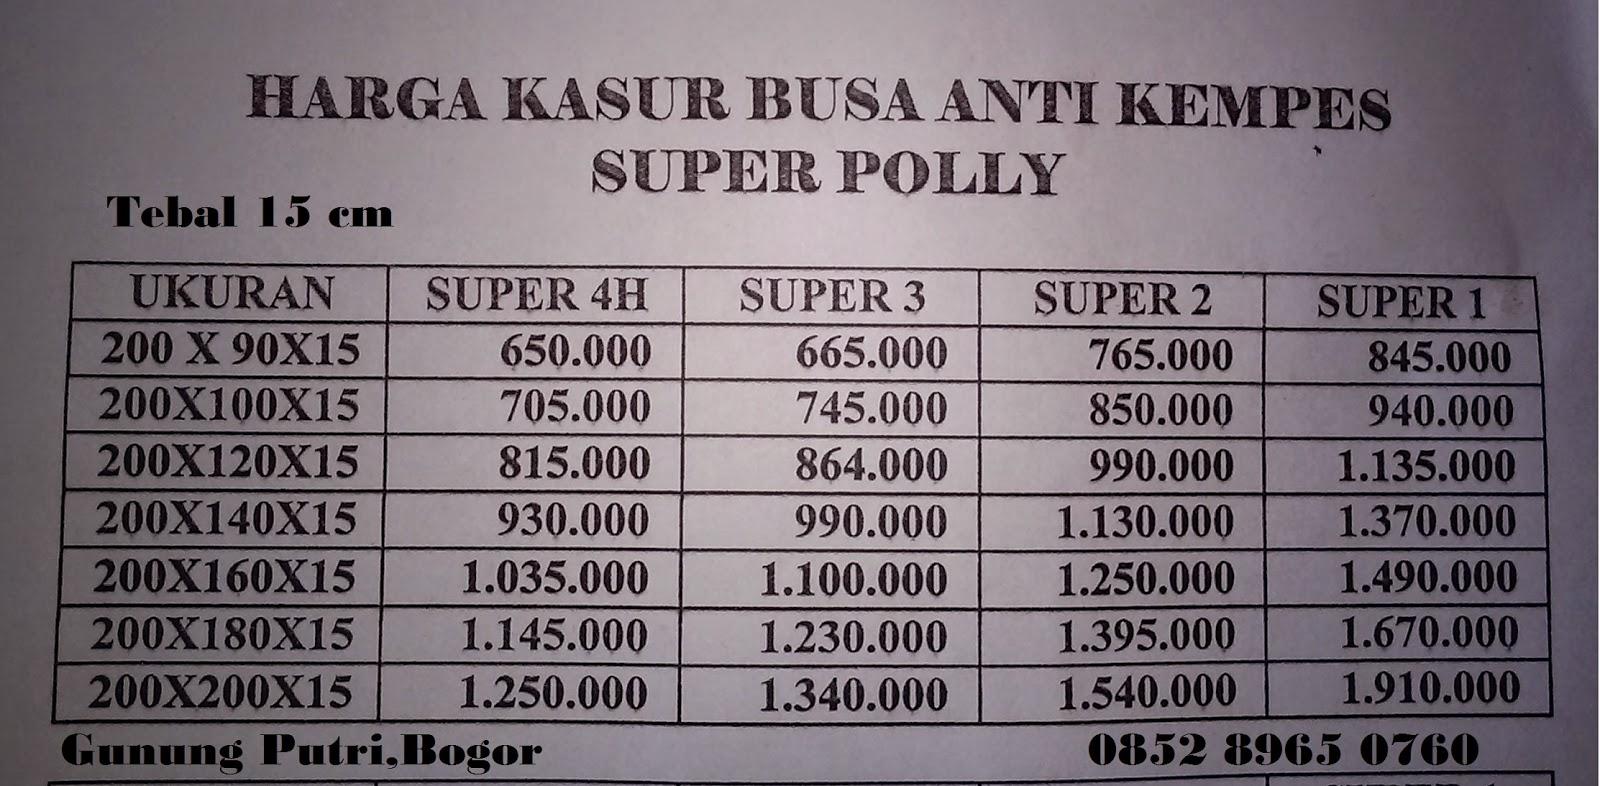 Harga Kasur Busa Murah Bandung Images